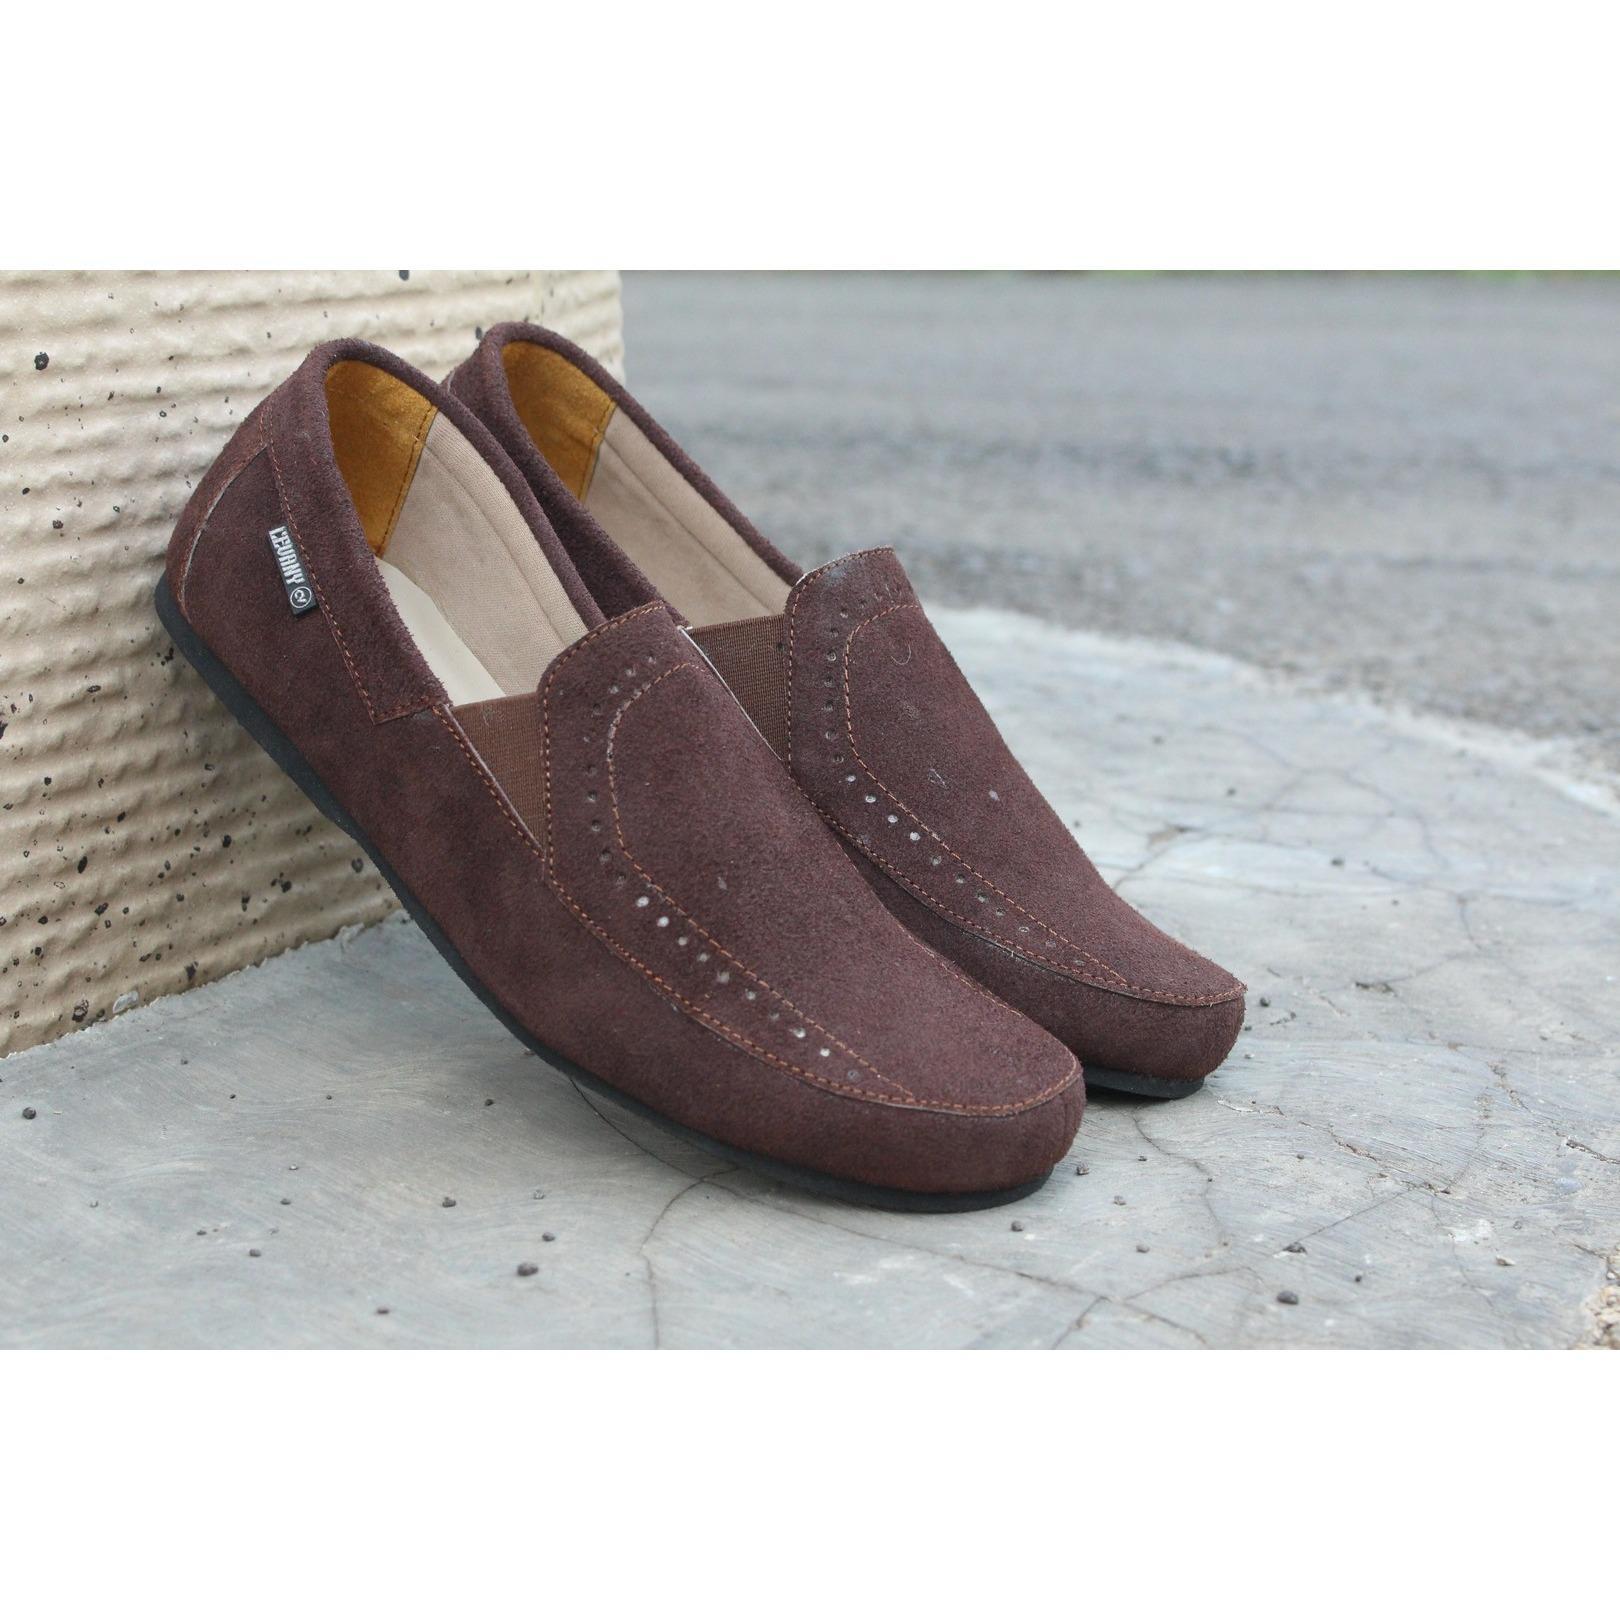 Sepatu Pria Clarks Kendar Mocassin Suede Slip On Loafers Sneakers Murah  Coklat